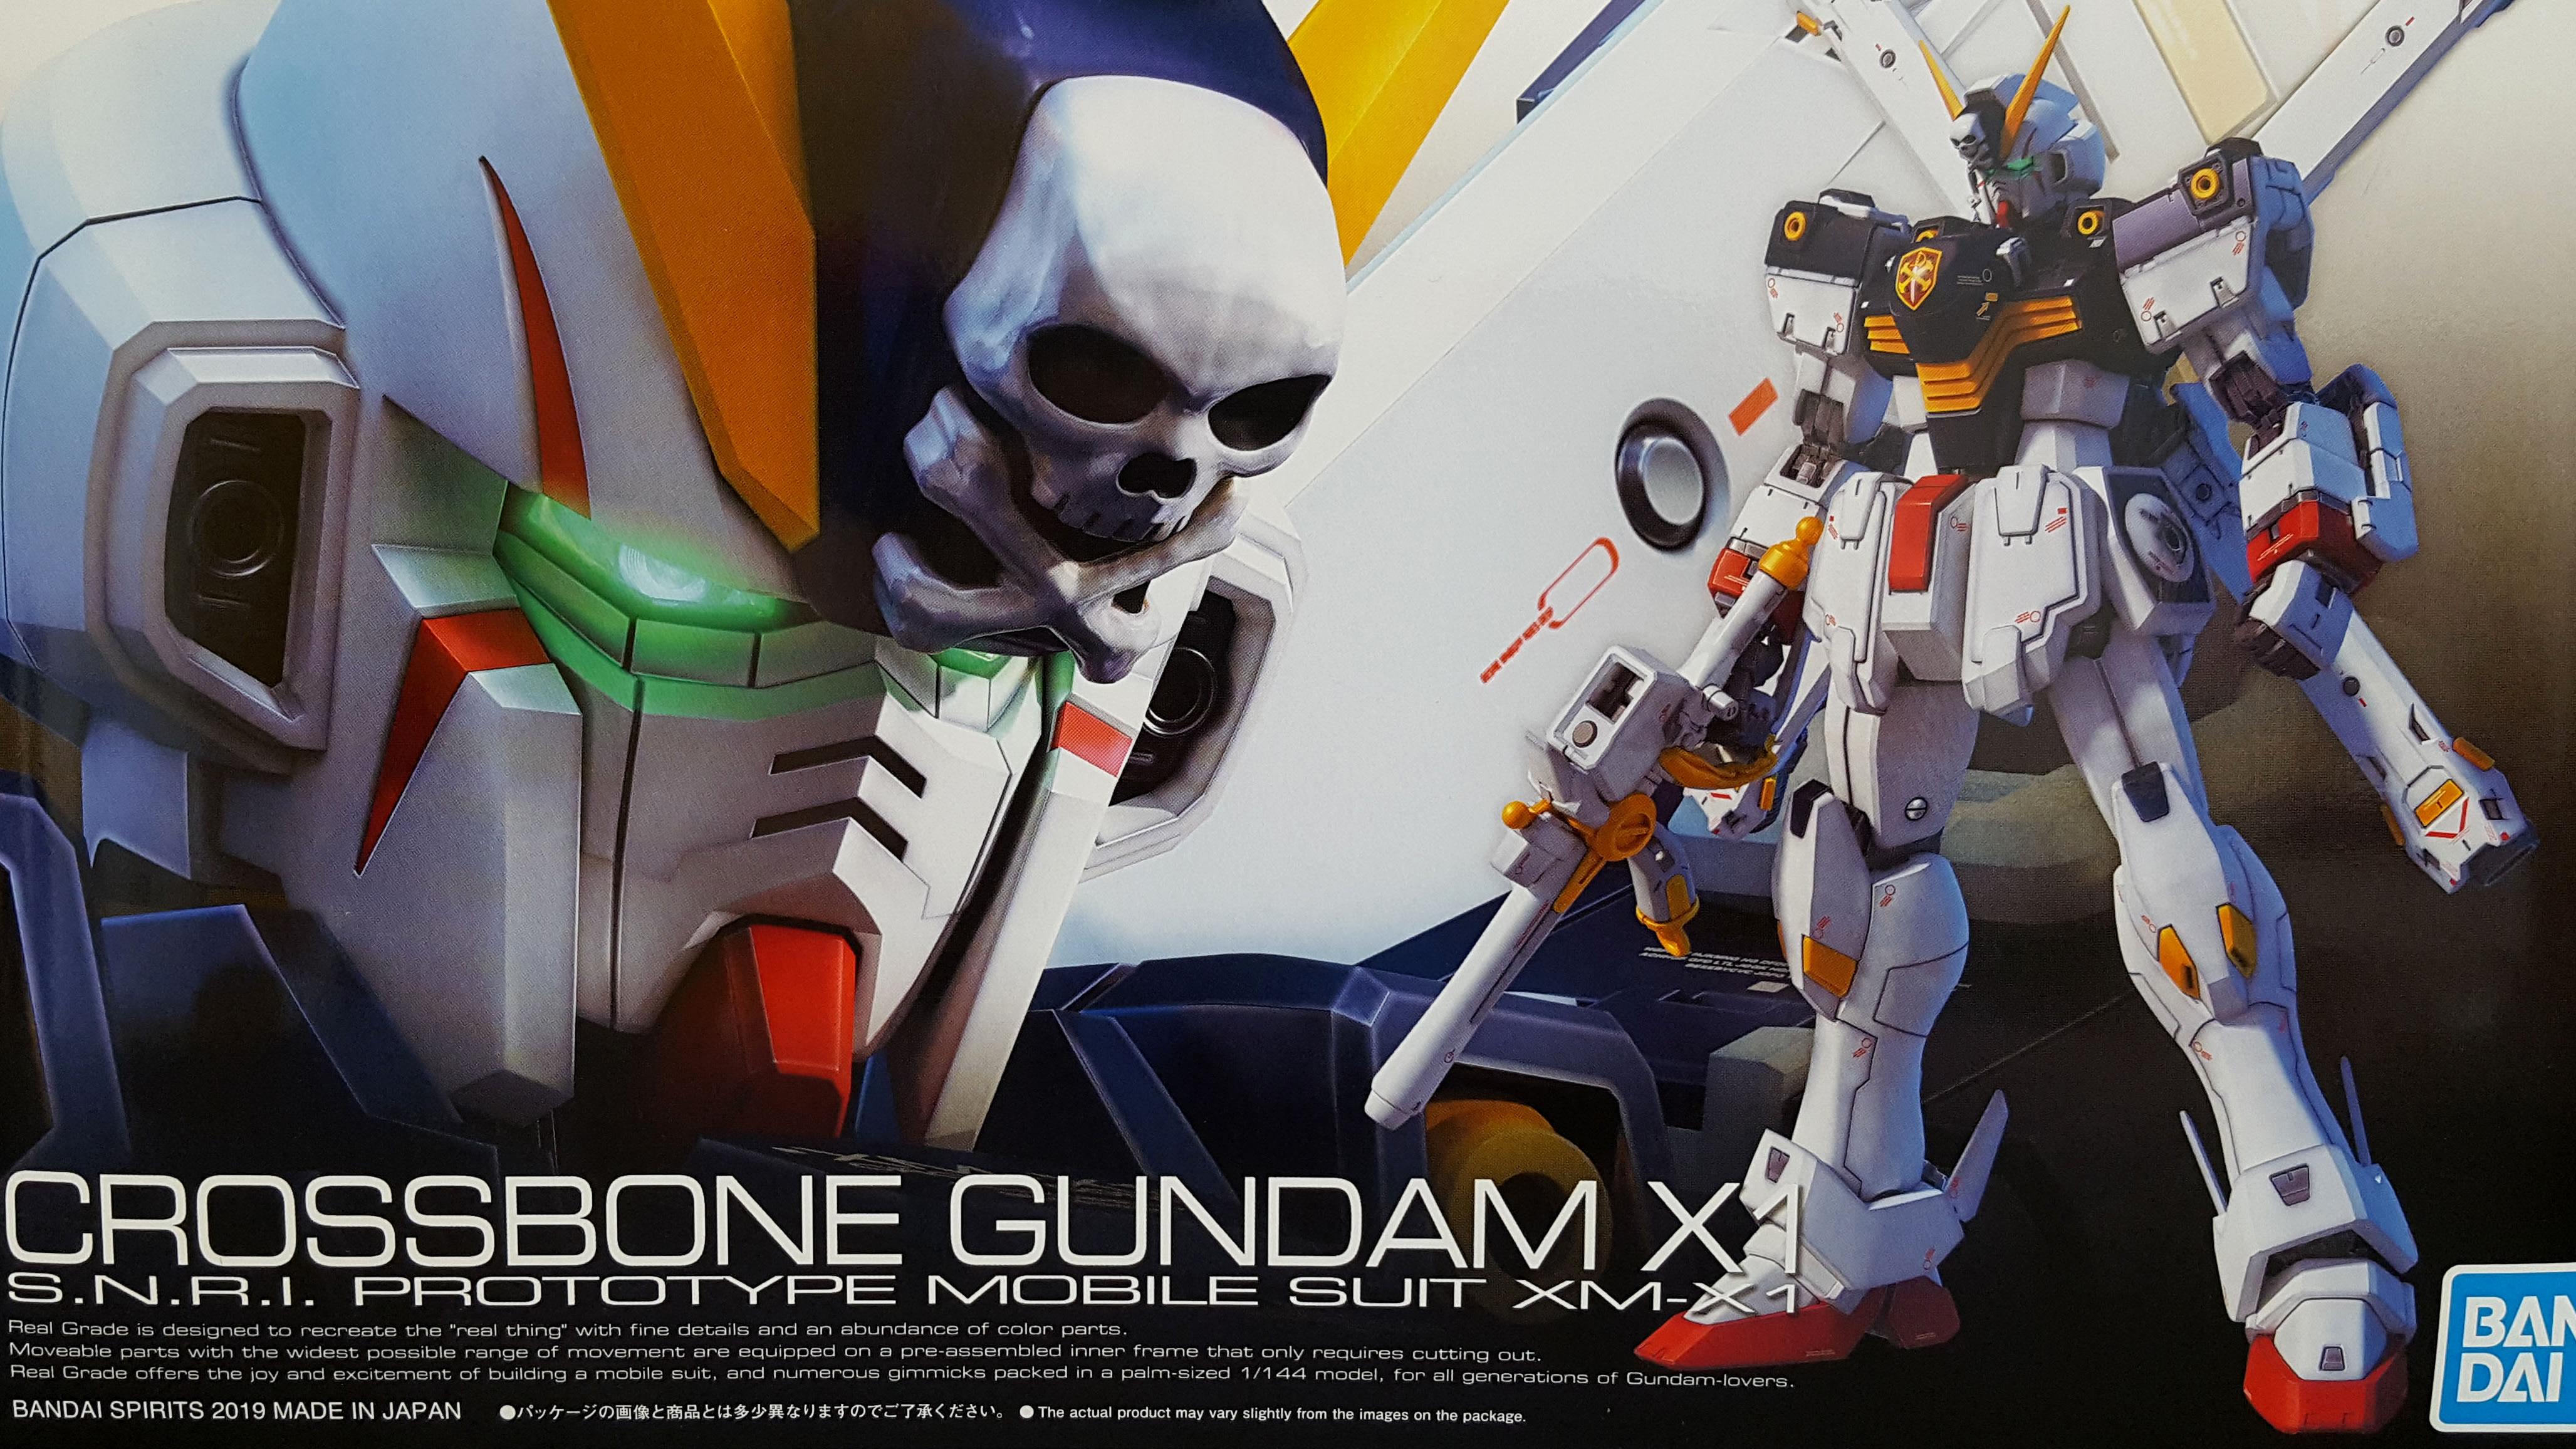 1/144 RG Crossbone Gundam X1 Unboxing